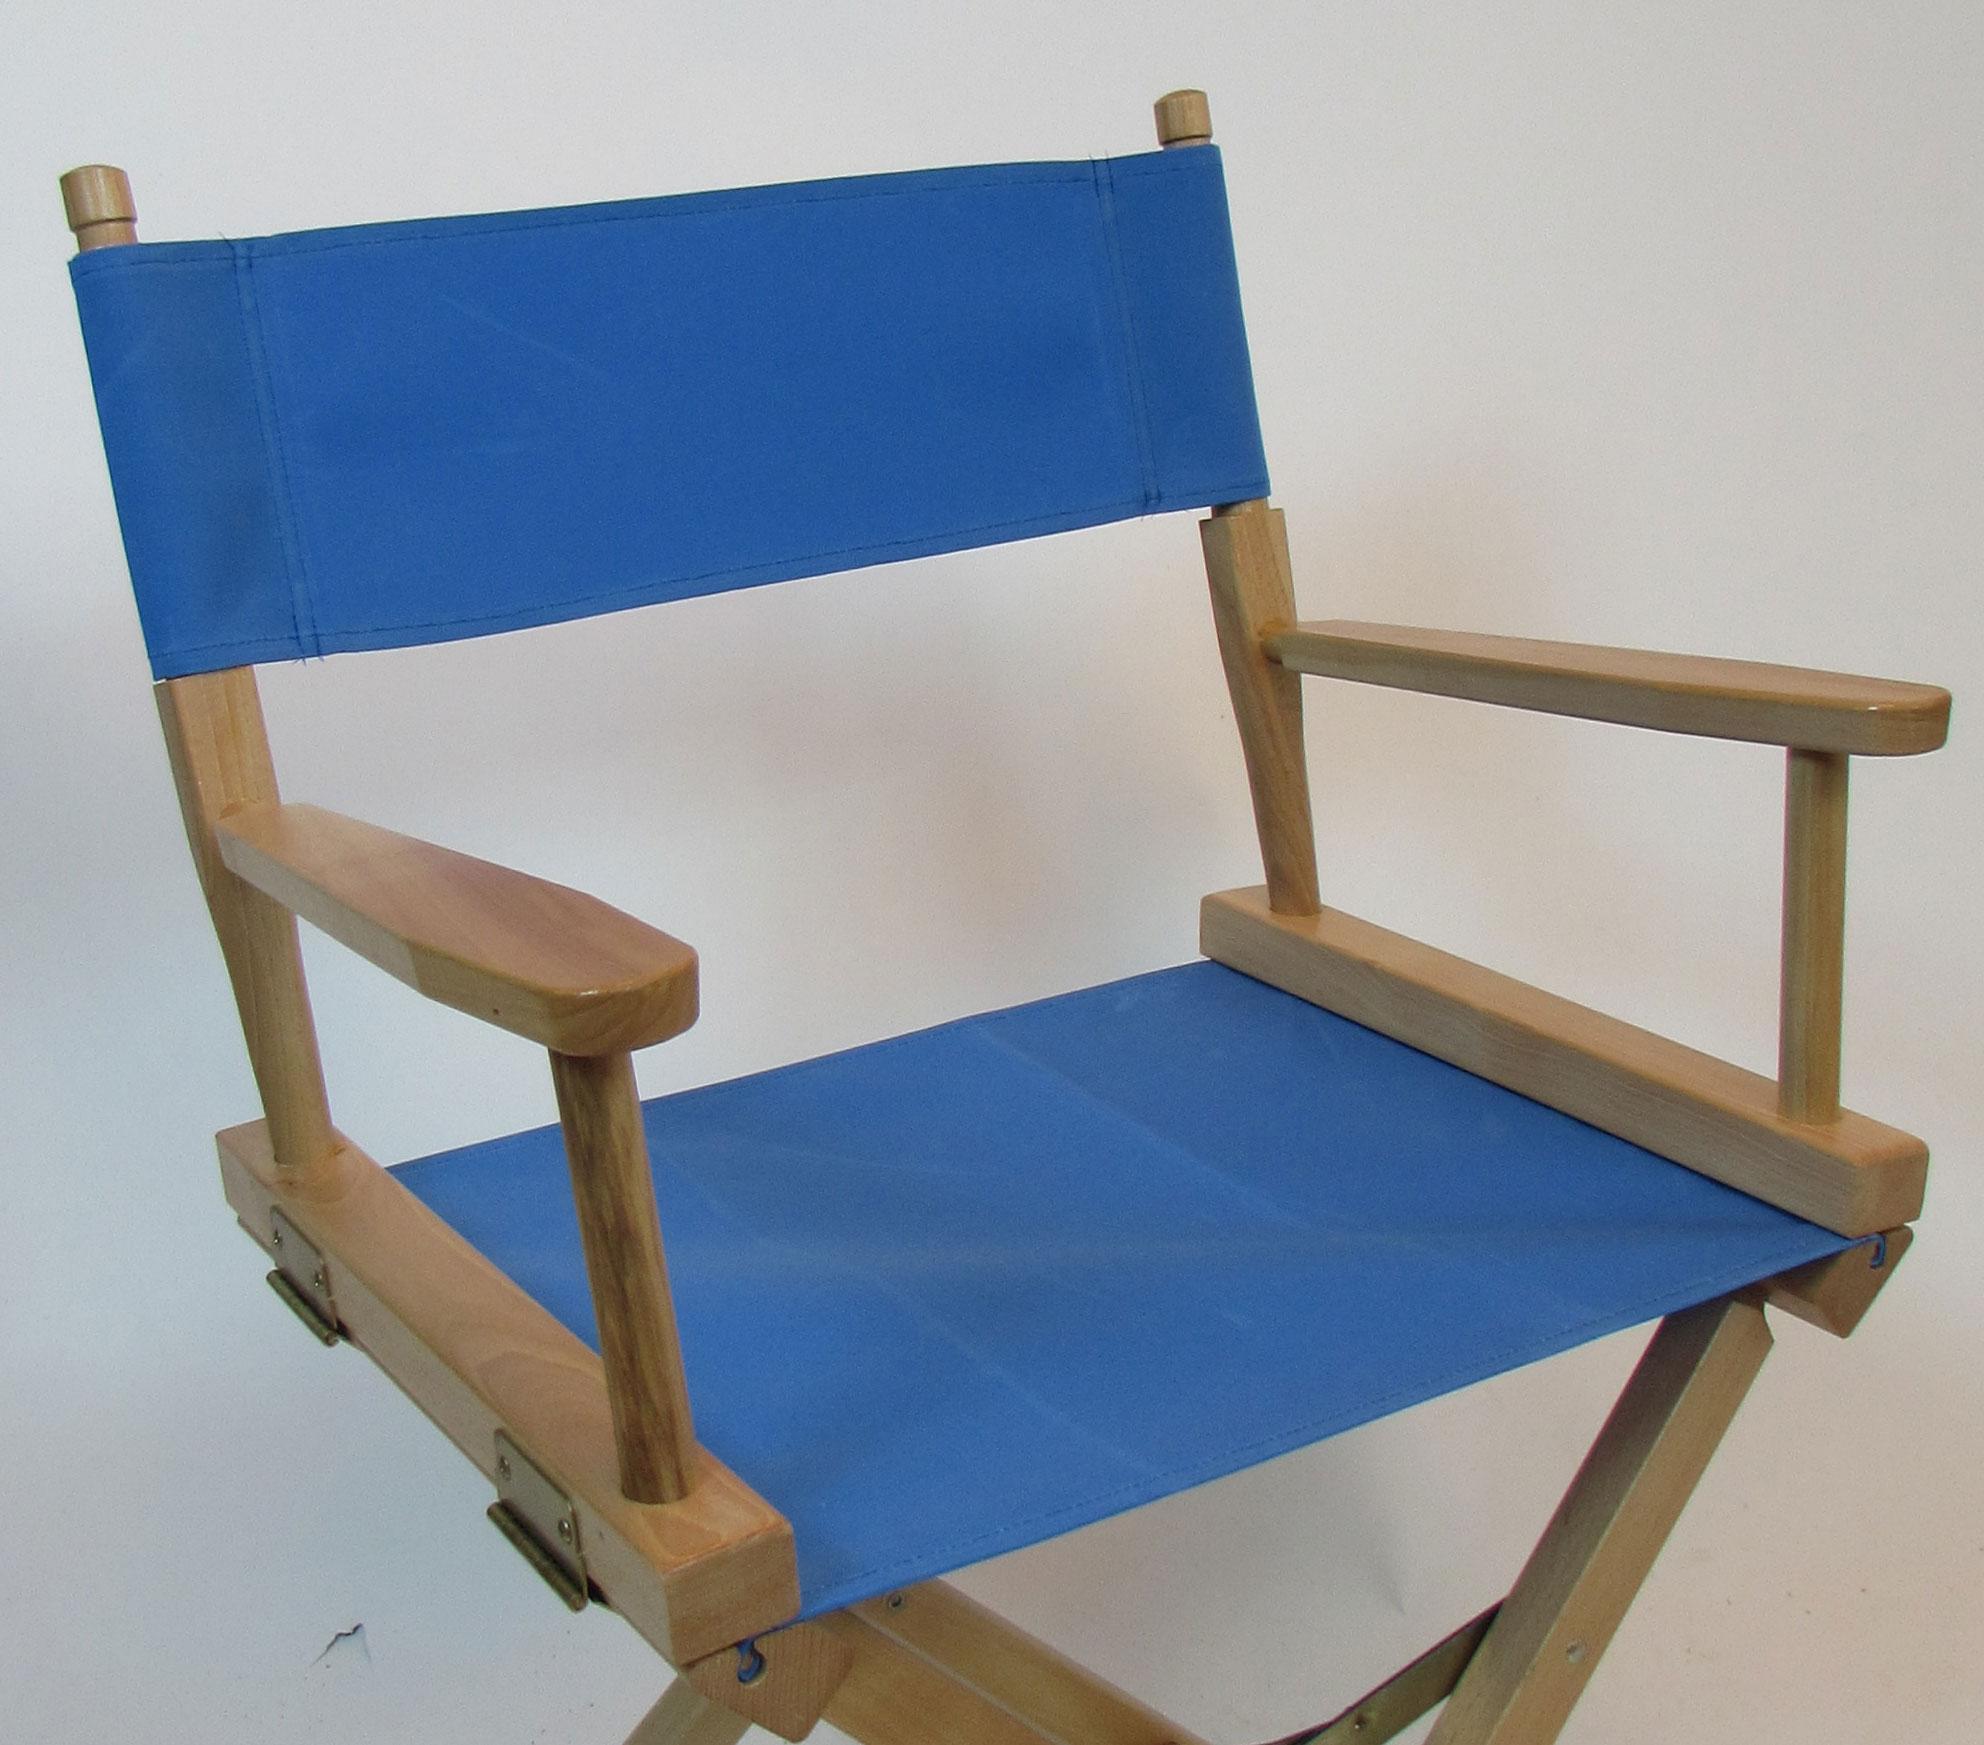 Sunbrella 239 191 189 Directors Chair Replacement Cover Flat Stick